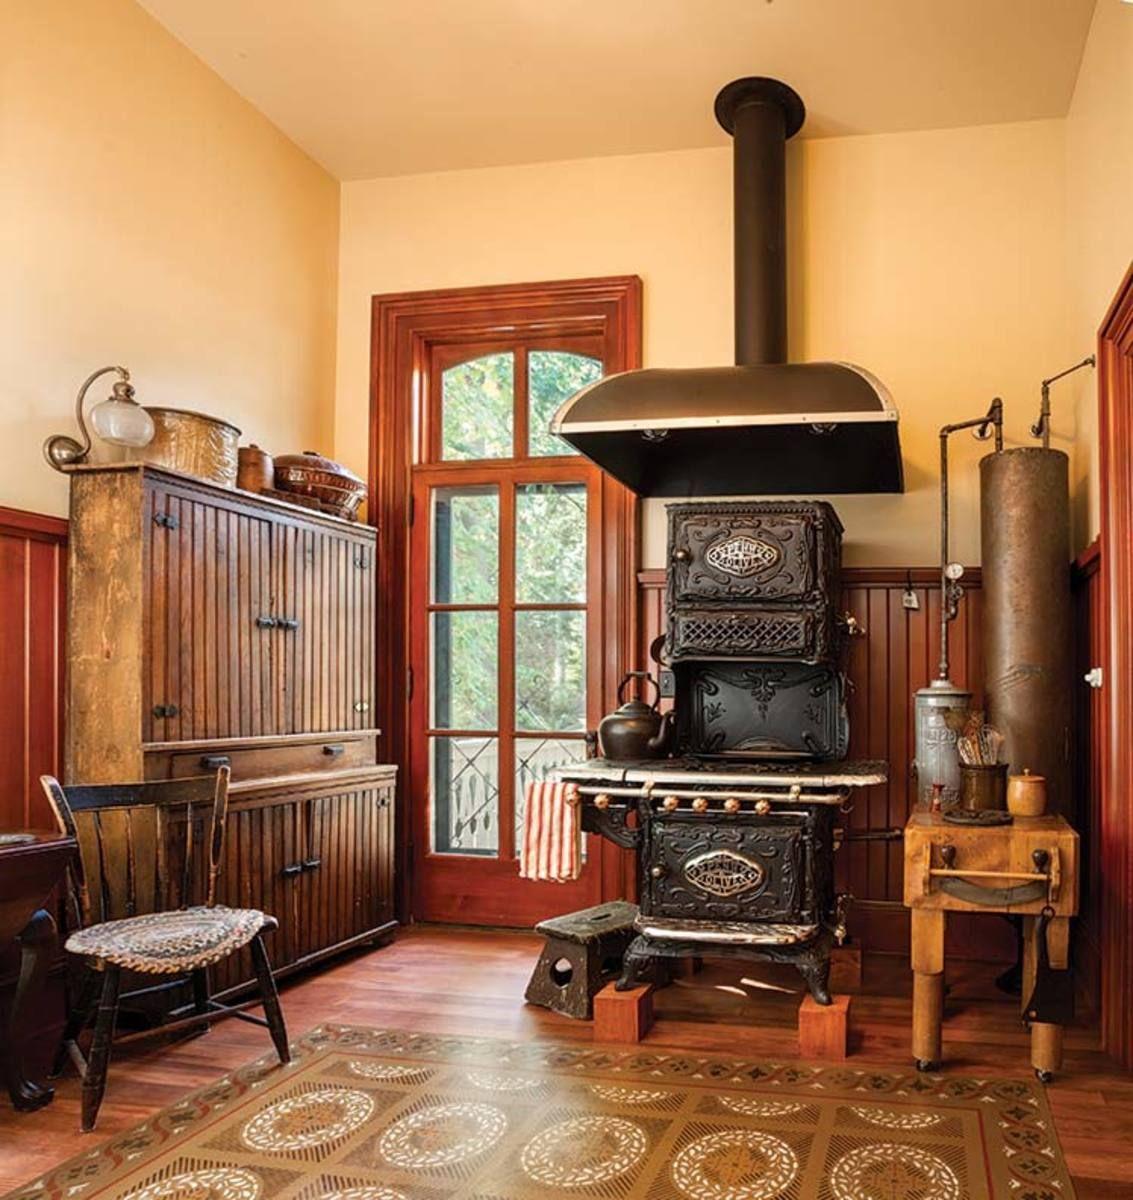 Old Vintage Kitchen: A Period-Perfect Victorian Kitchen